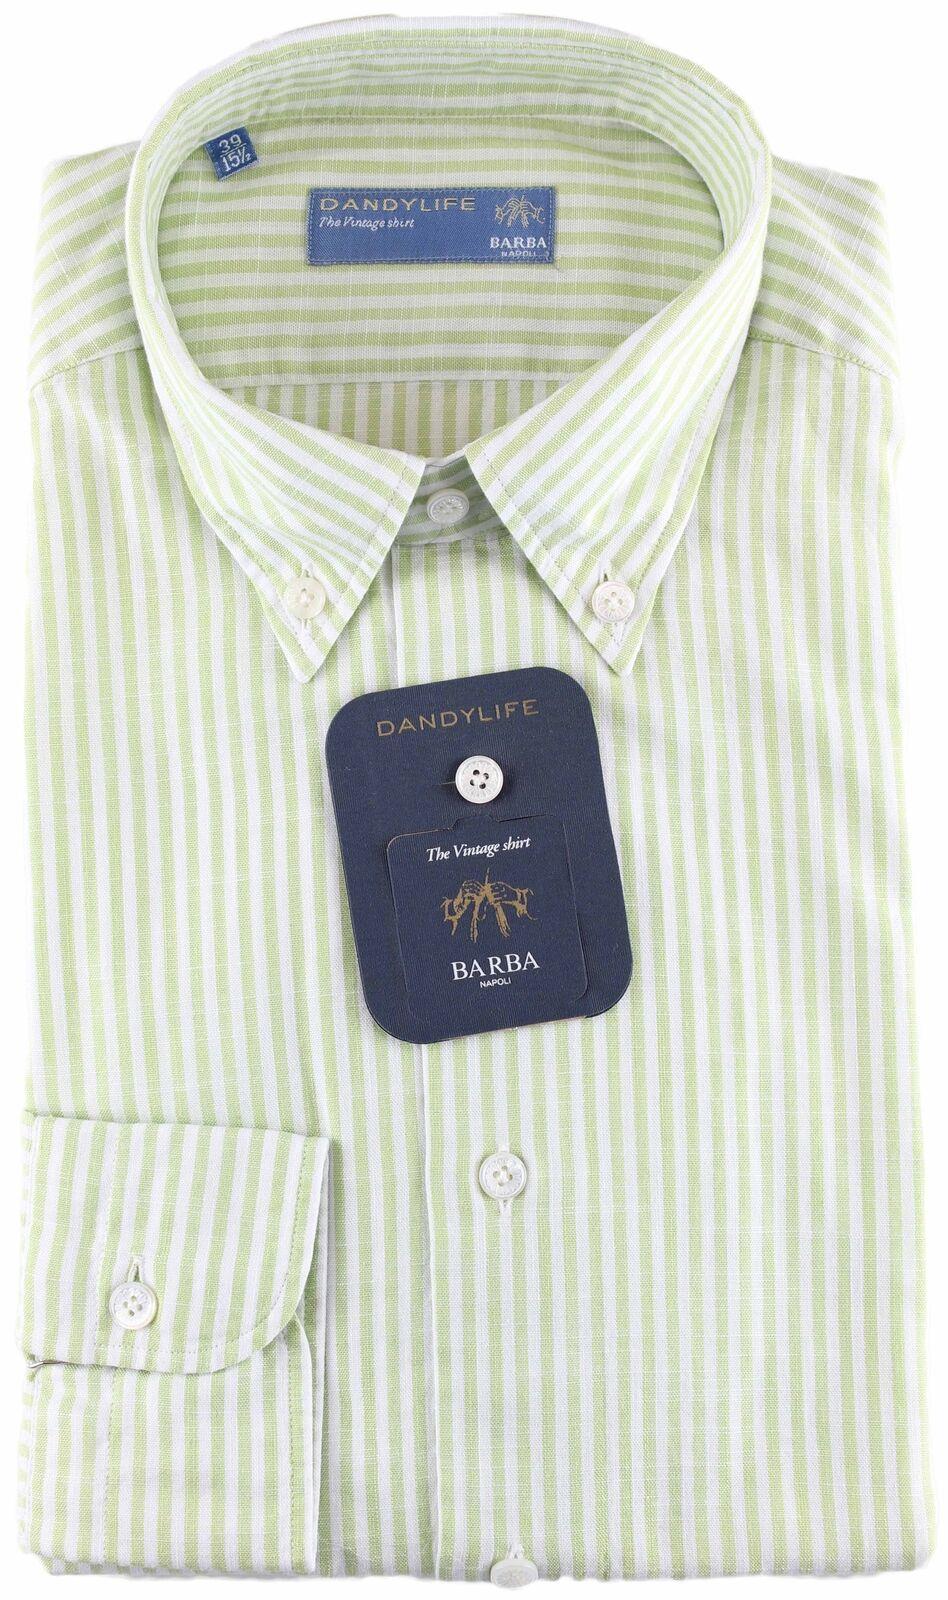 NWT BARBA NAPOLI hemd dandy life Weiß Grün striped handmade 39 15 1 2